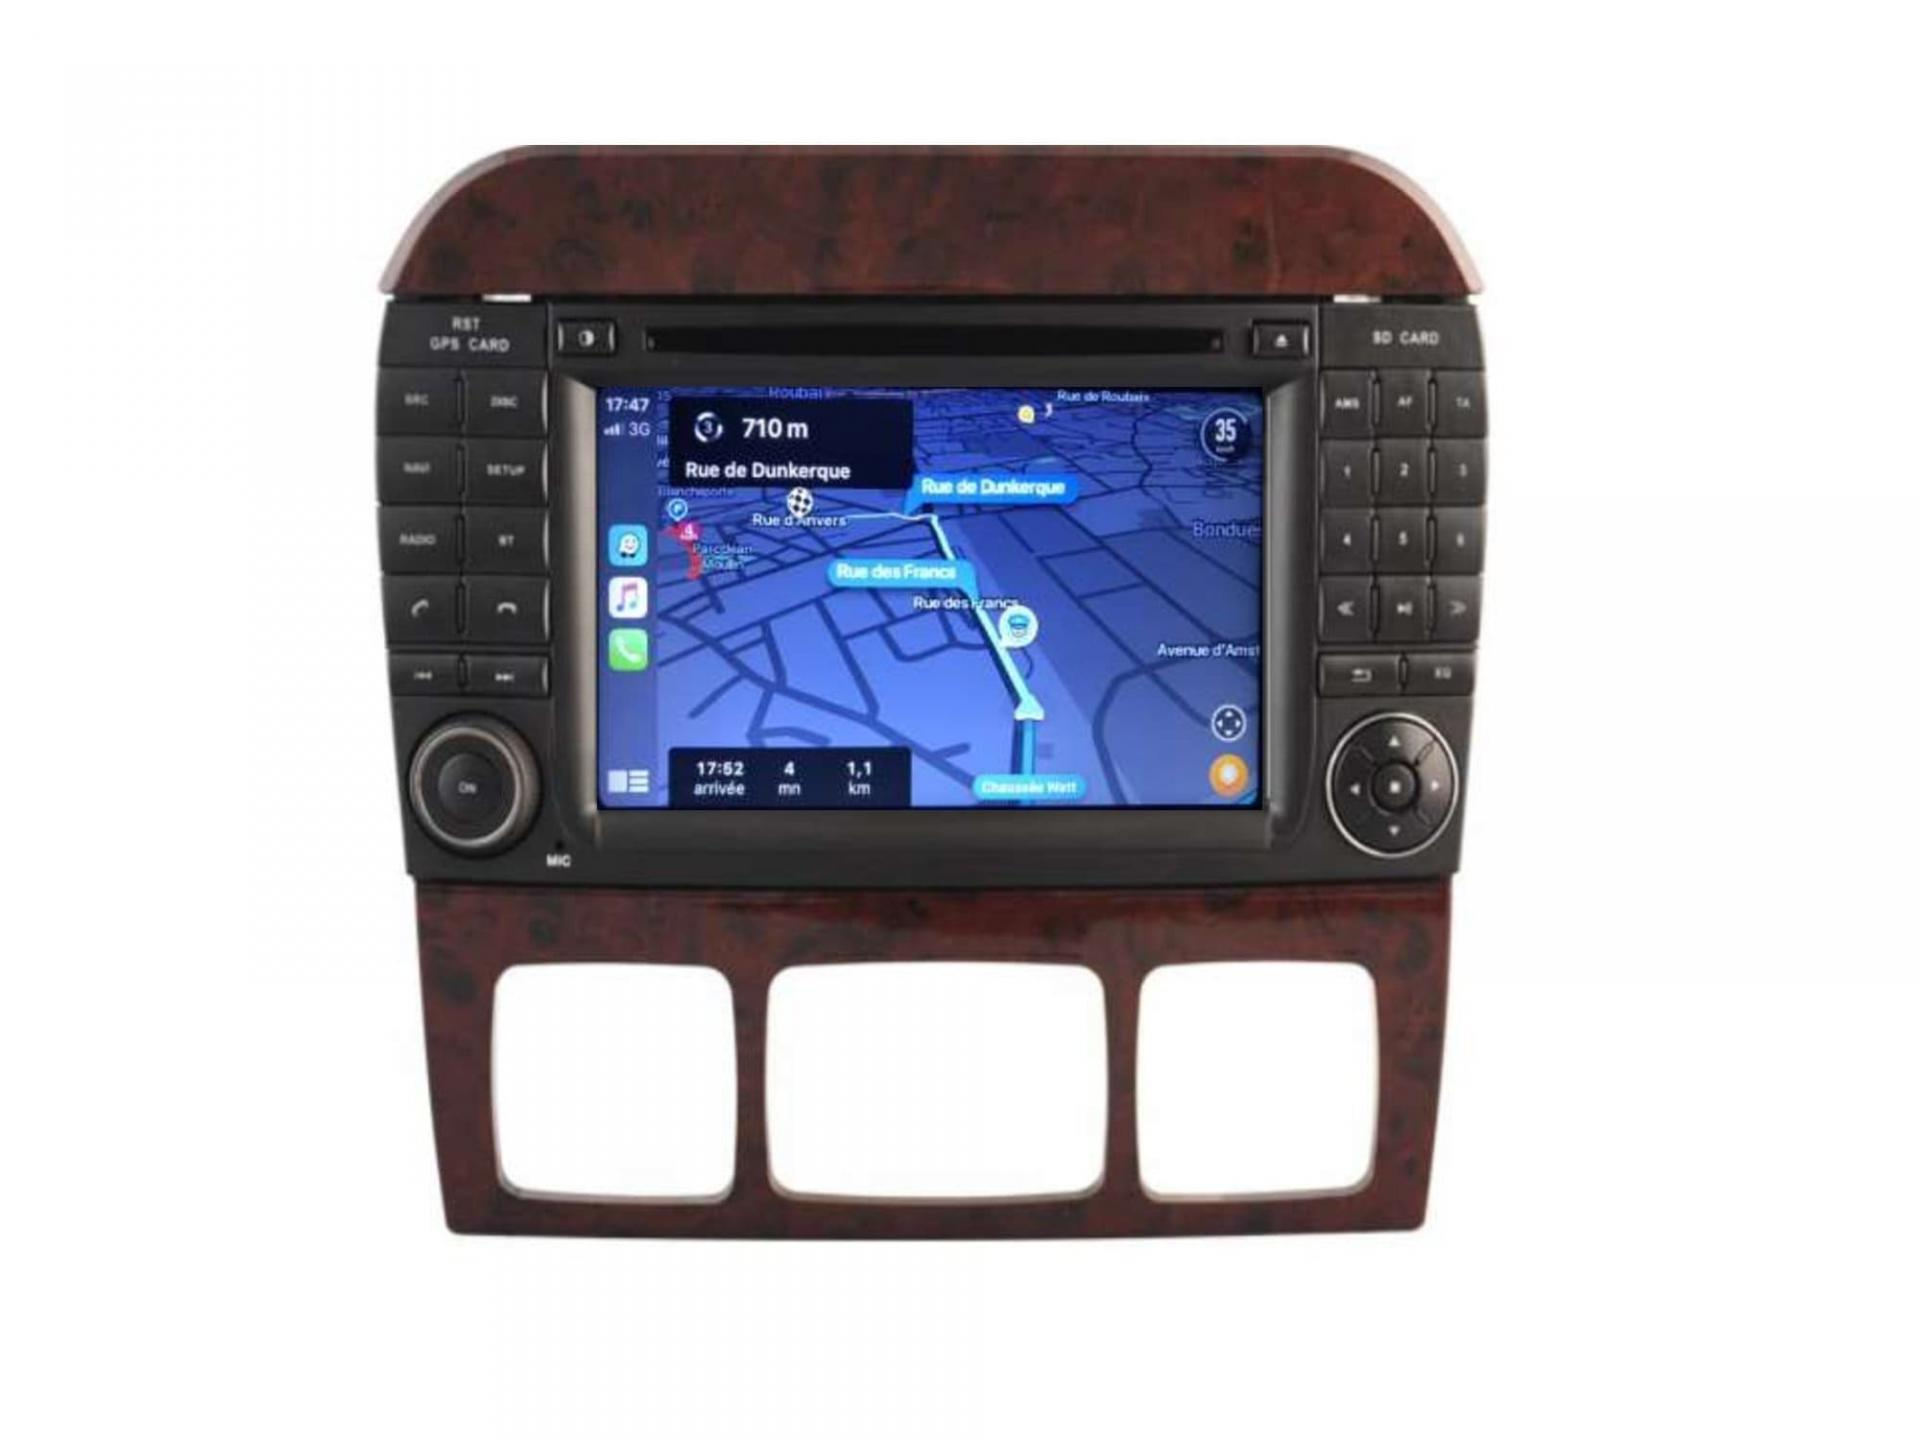 Autoradio gps carplay android auto gps bluetooth mercedes classe s w220 classe cl w215 3